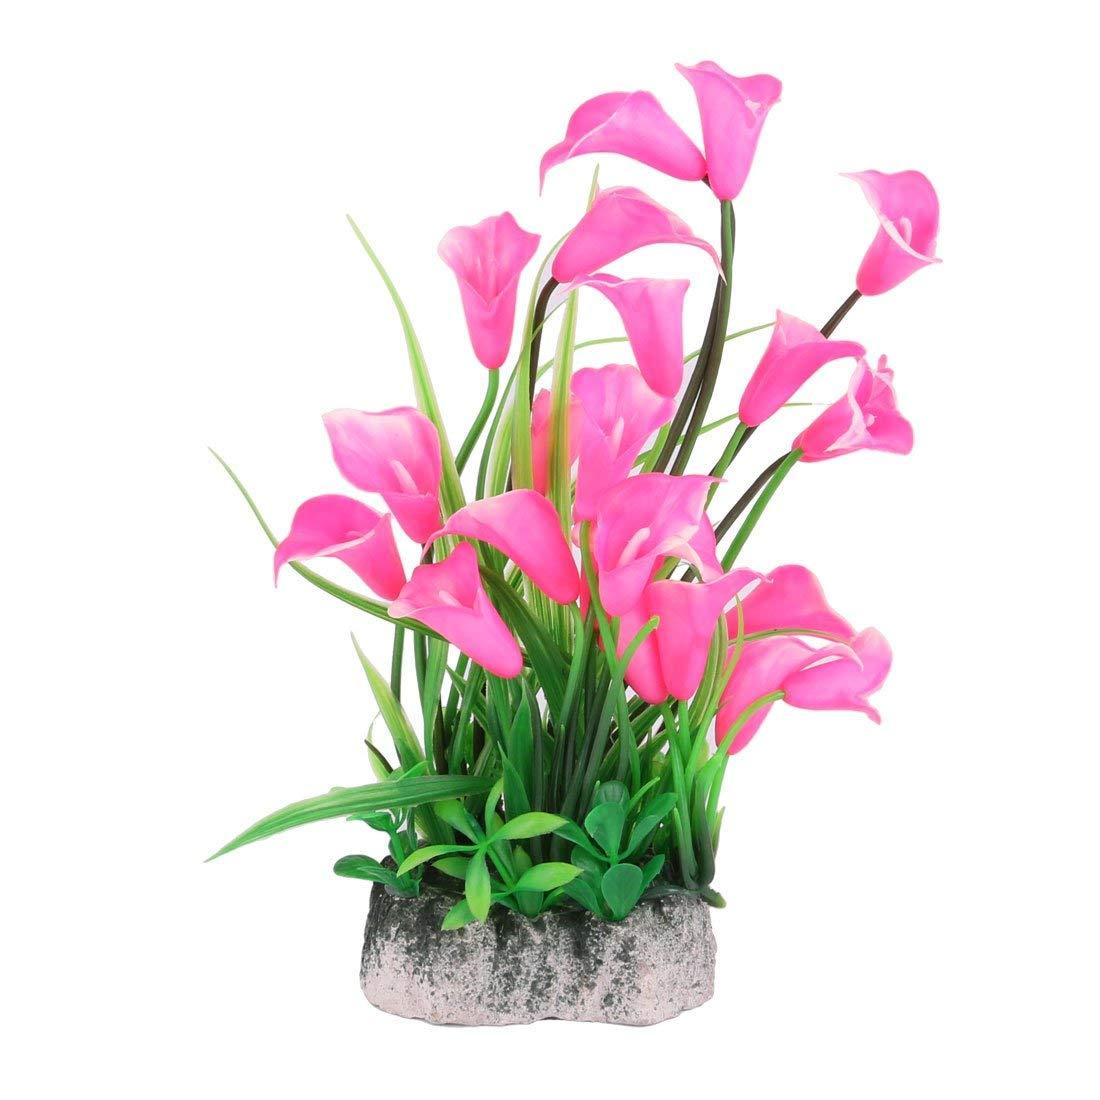 Fish Tank Artificial Flower Bouquet Ornament Aquarium Plant 2 Pcs Pink Green